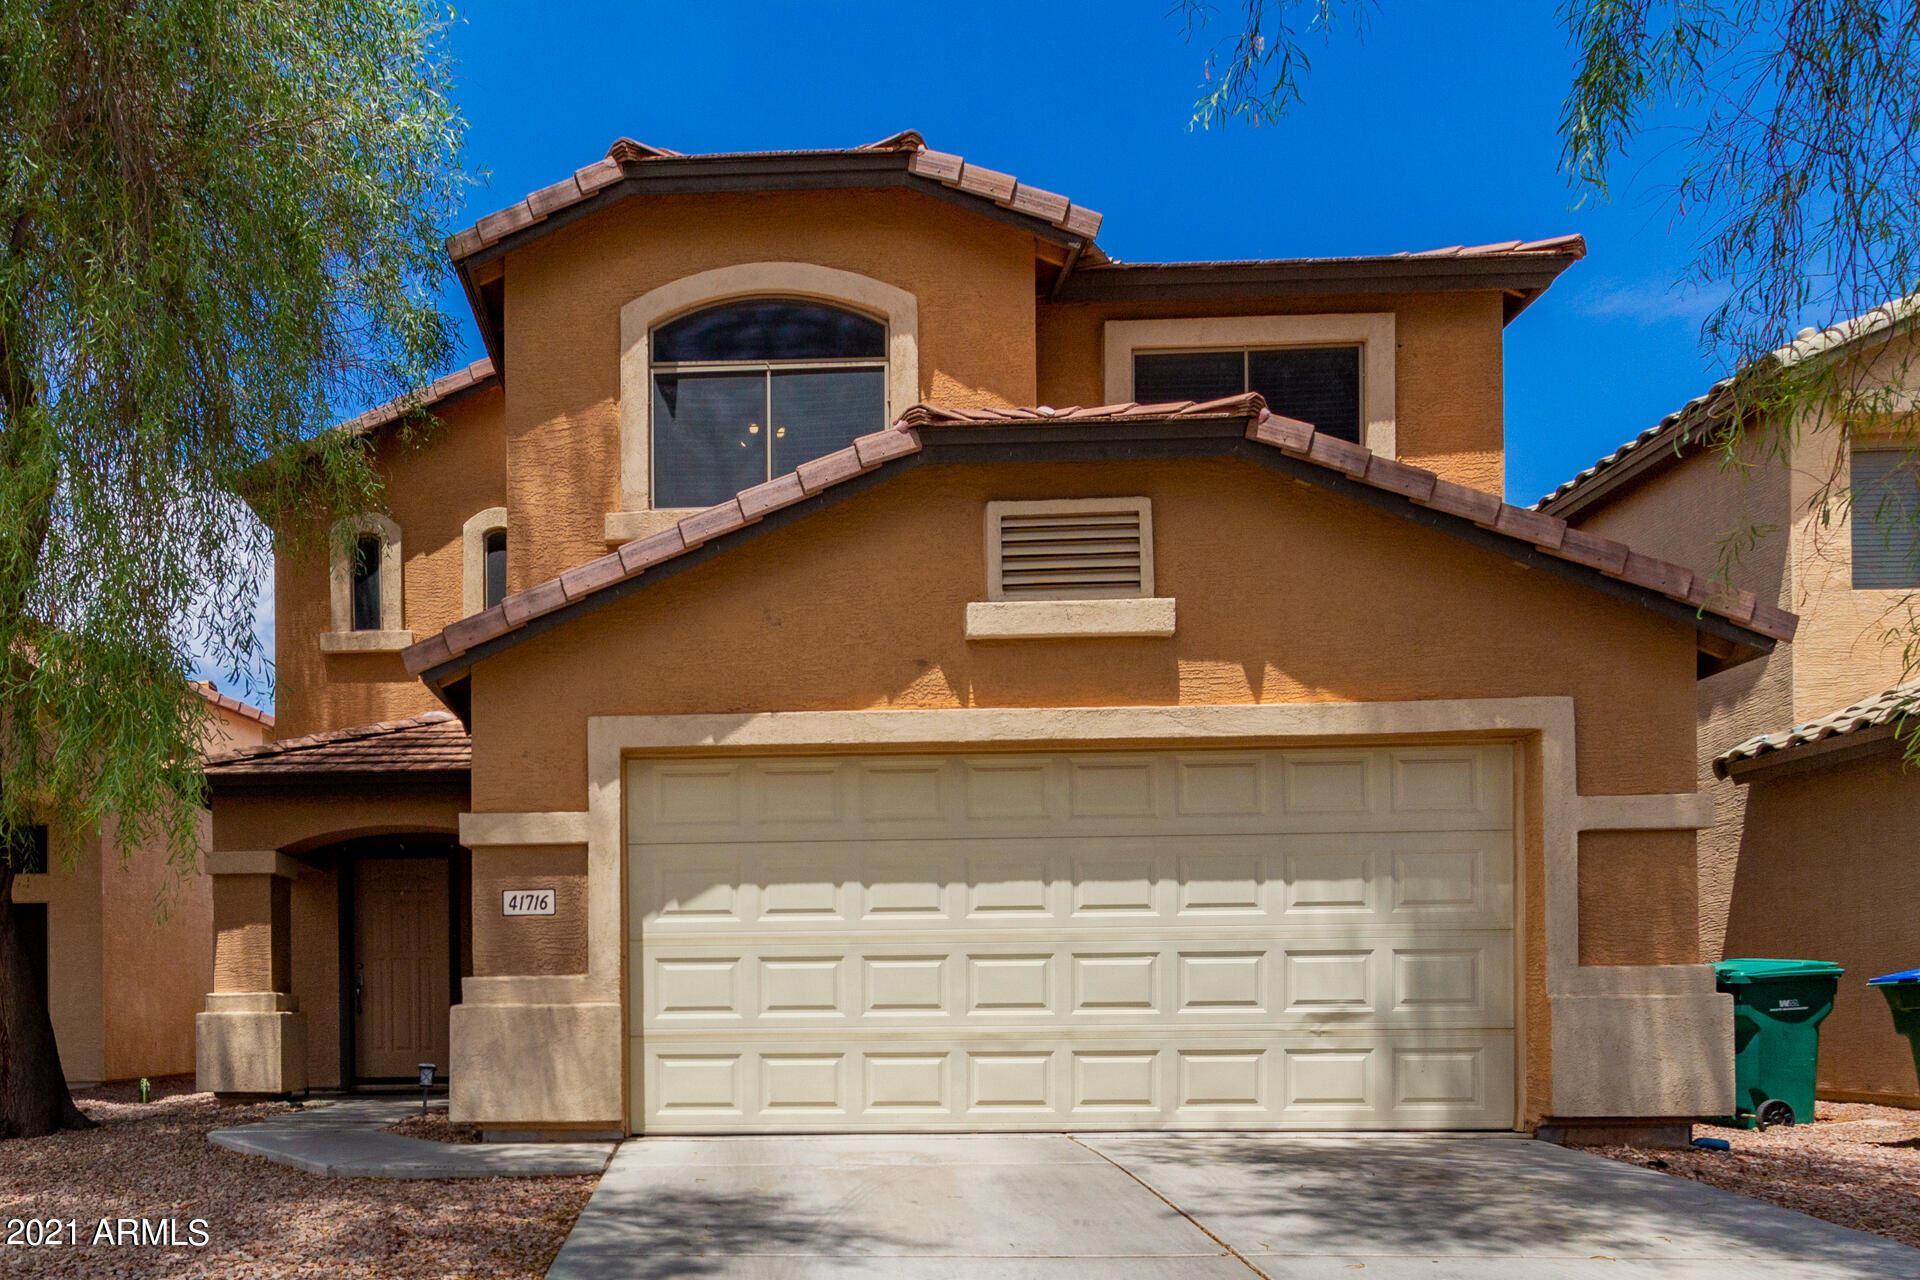 Photo for 41716 W SUNLAND Drive, Maricopa, AZ 85138 (MLS # 6266364)